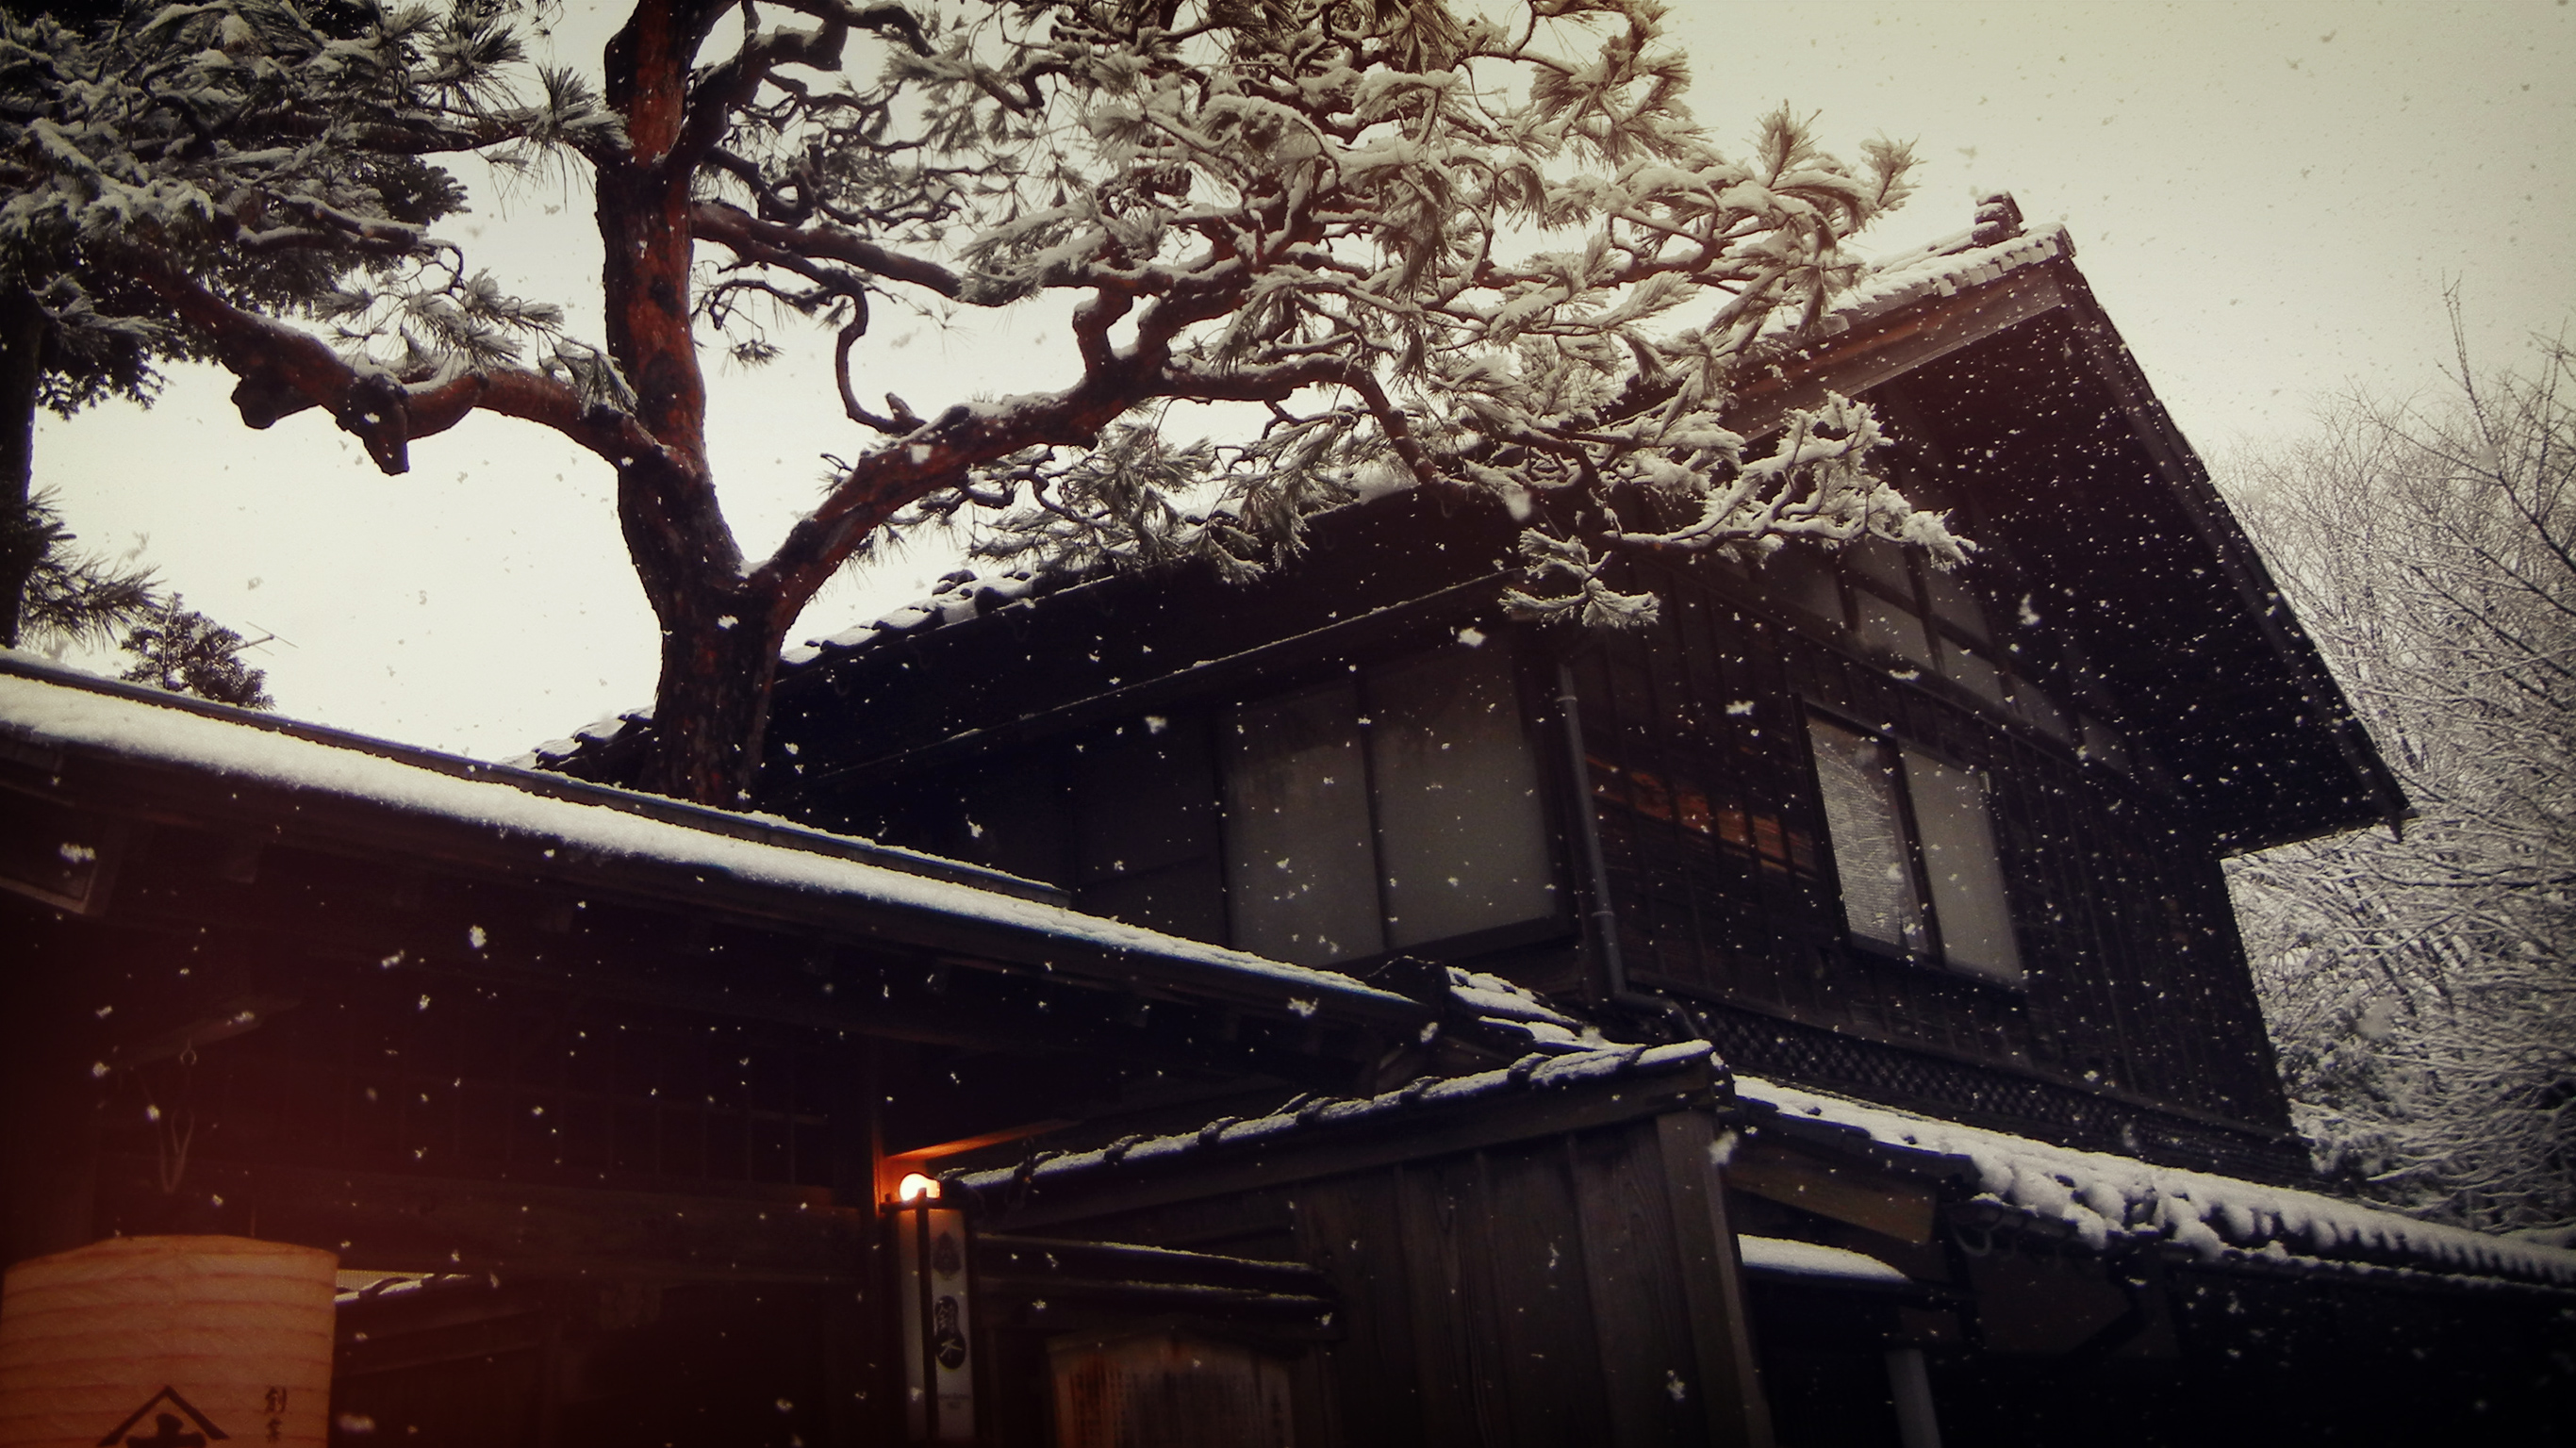 hokkaido-winter-festivals